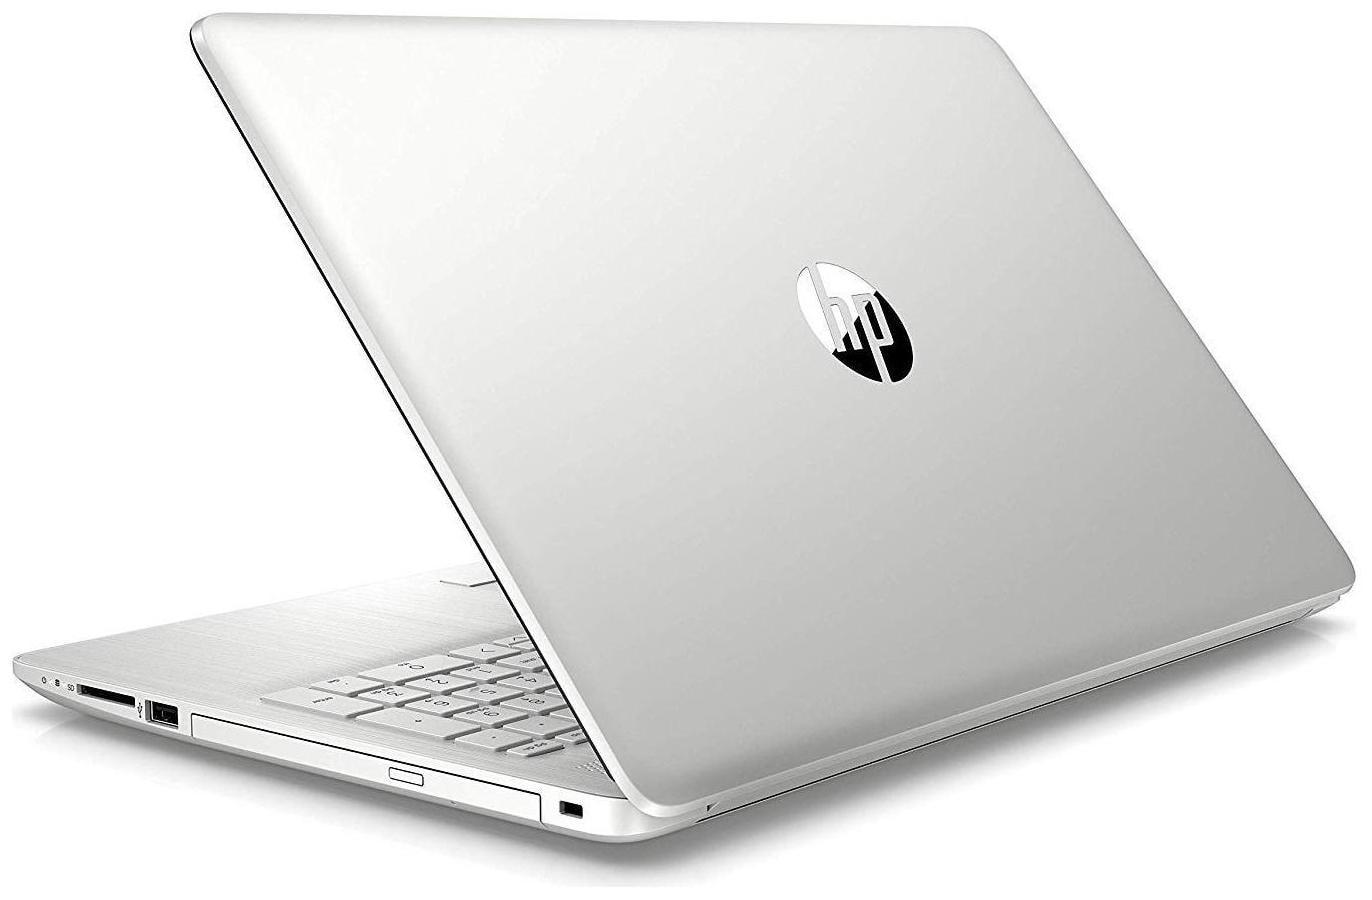 HP 15 (Core i3-7th Gen/4 GB/1 TB/ 39.62 cm (15.6 Inch) FHD/ Windows 10 with MSO HandS )15-da0327tu (Natural Silver, 2.1 Kg)